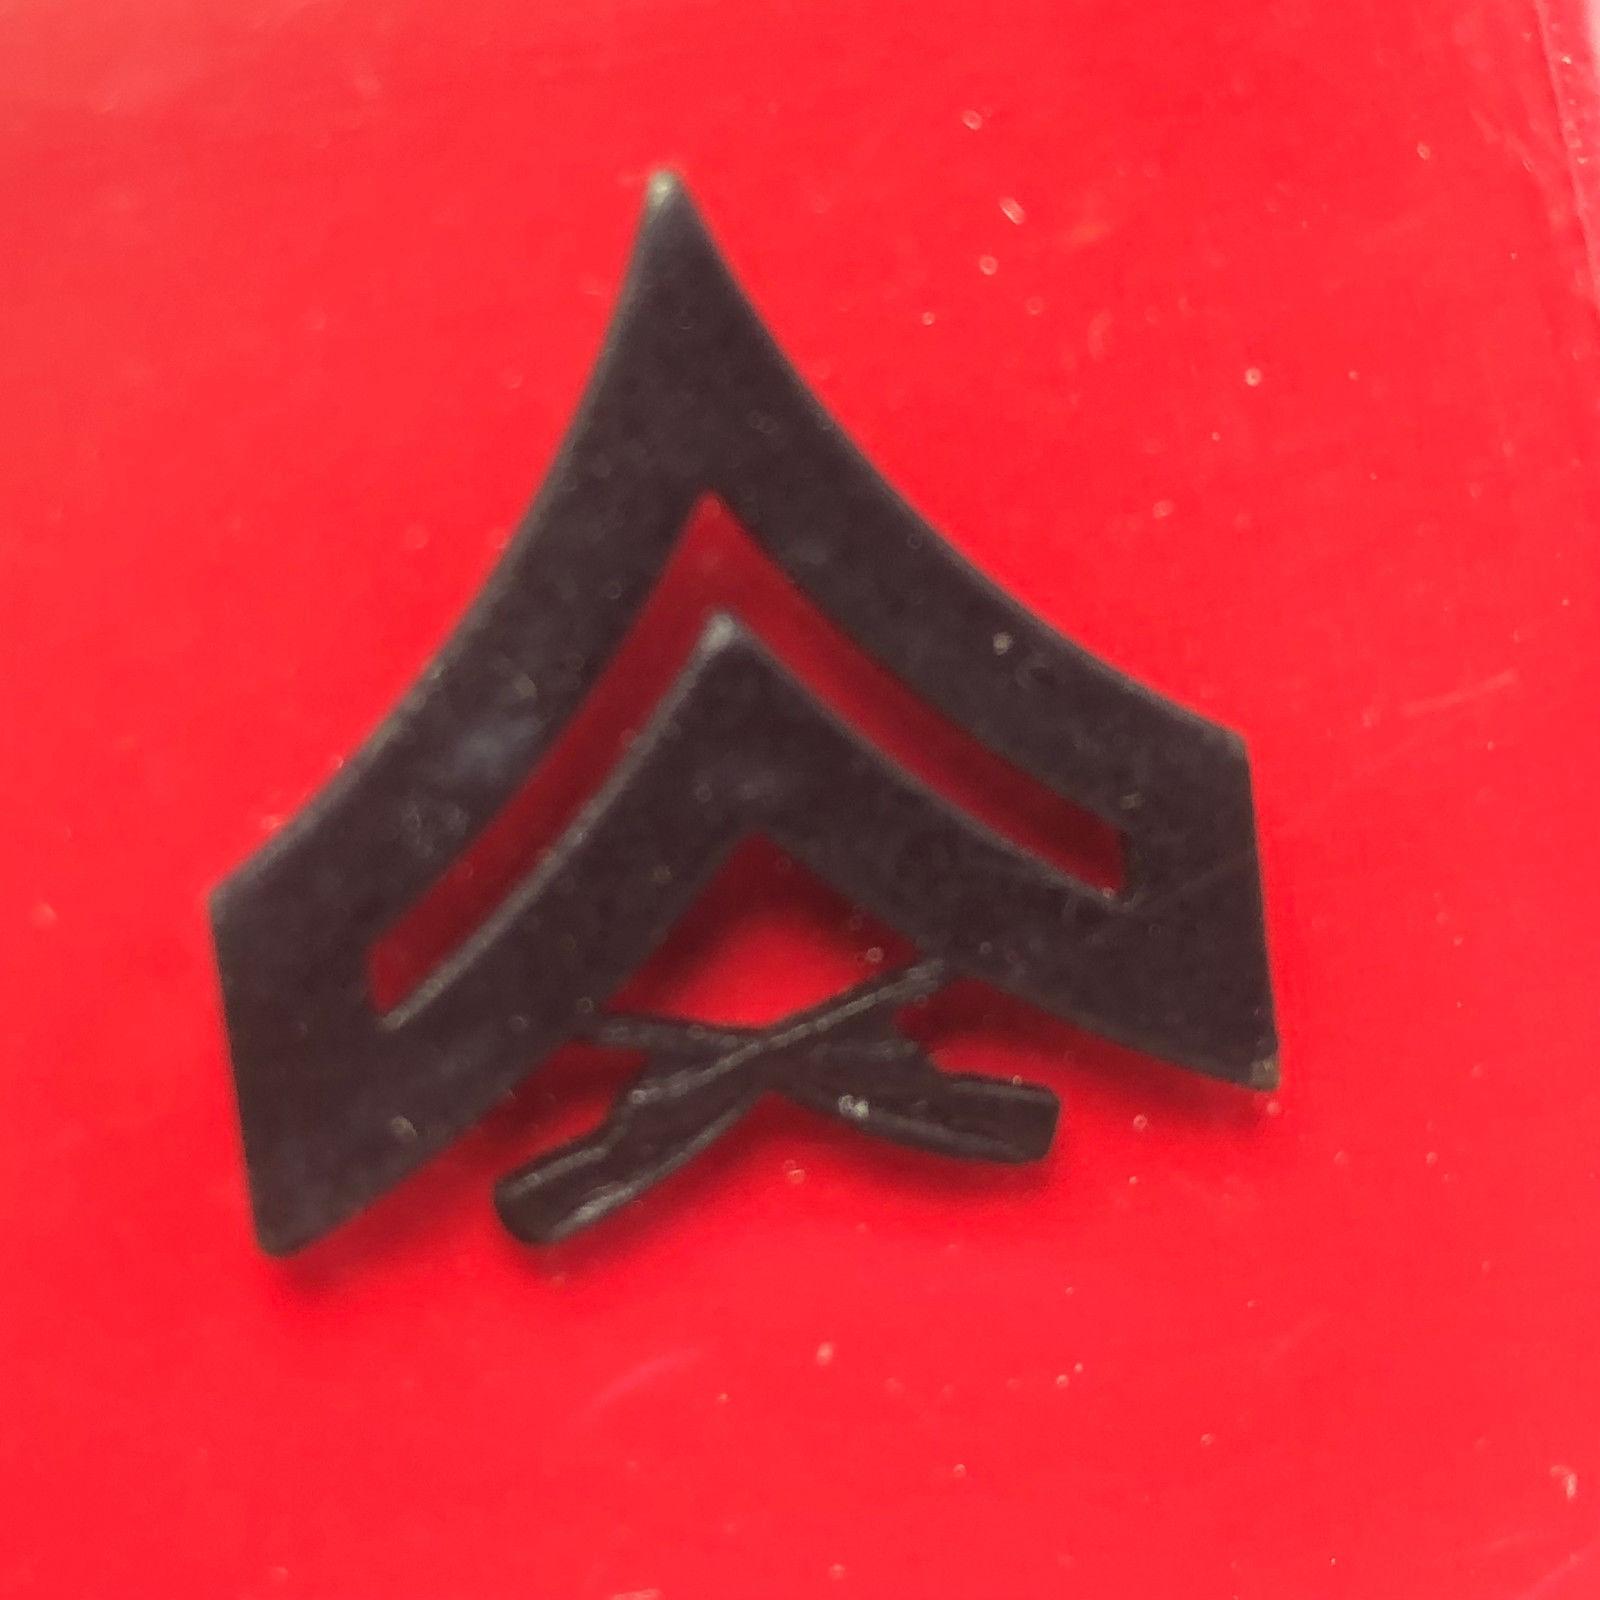 Vanguard Insignia Military Pins Pinbacks Nib and 50 similar